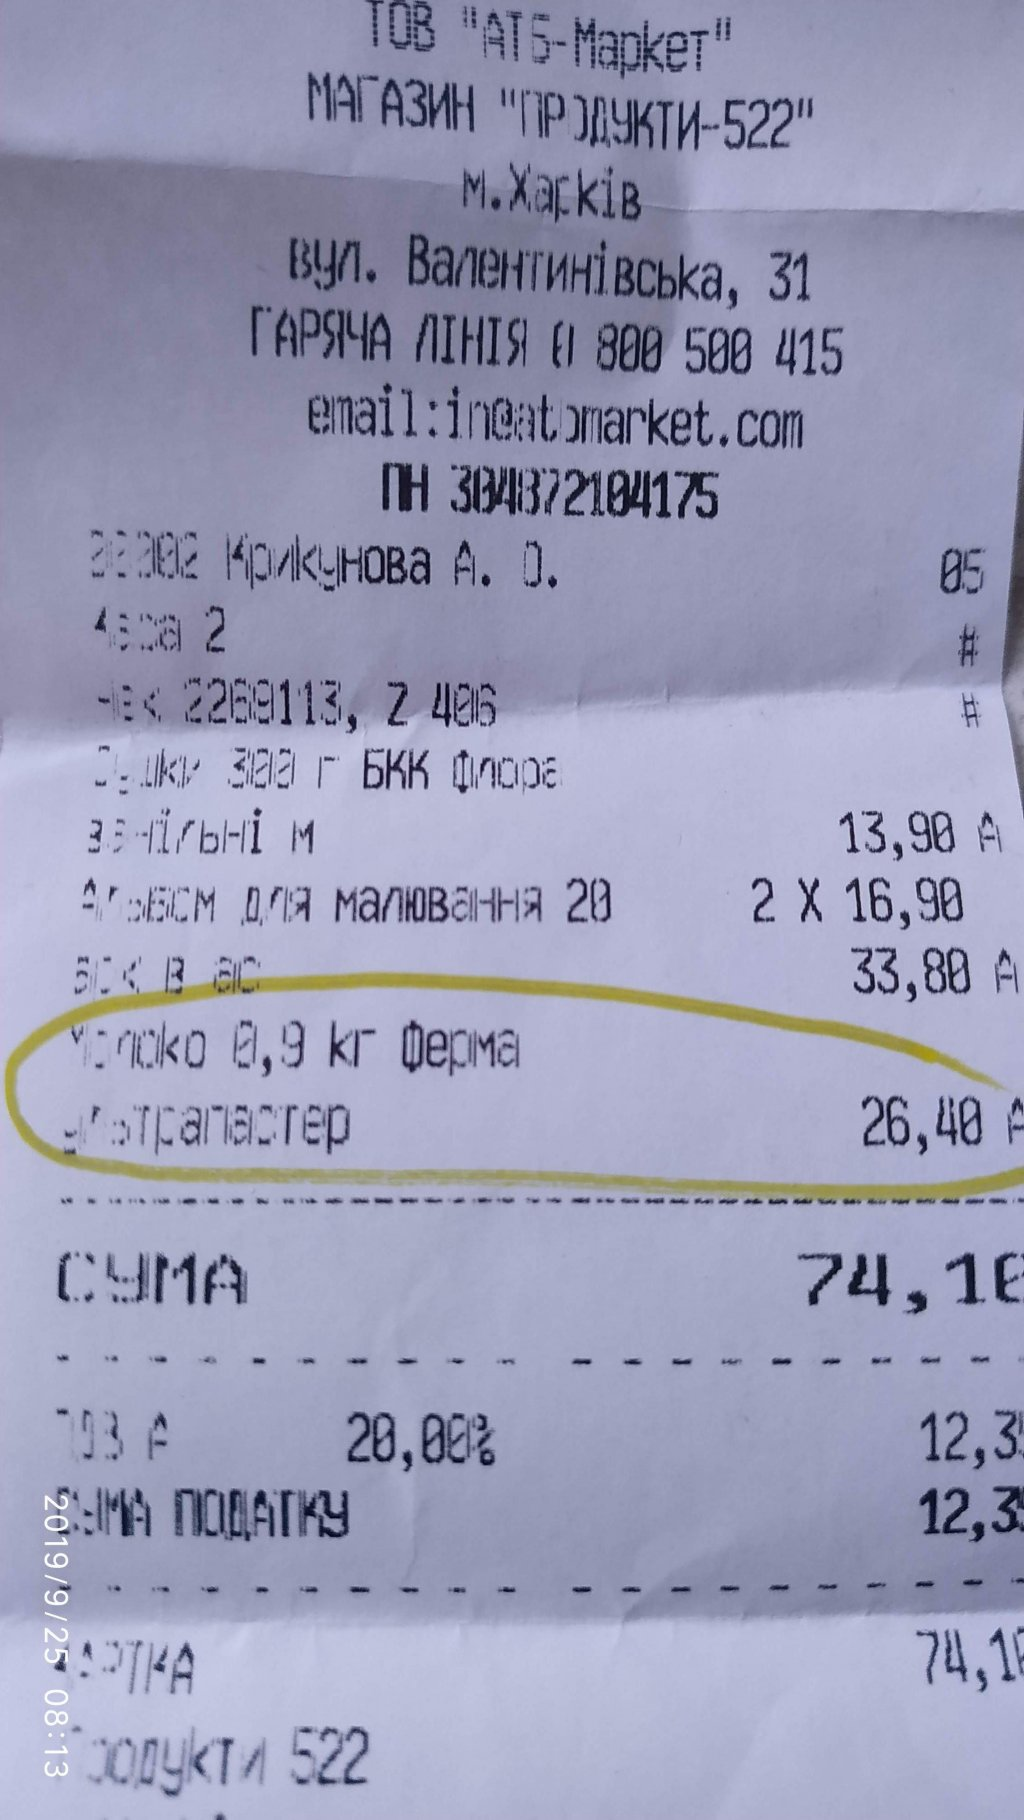 АТБ - Цены не ниже других супермаркетов, даже выше